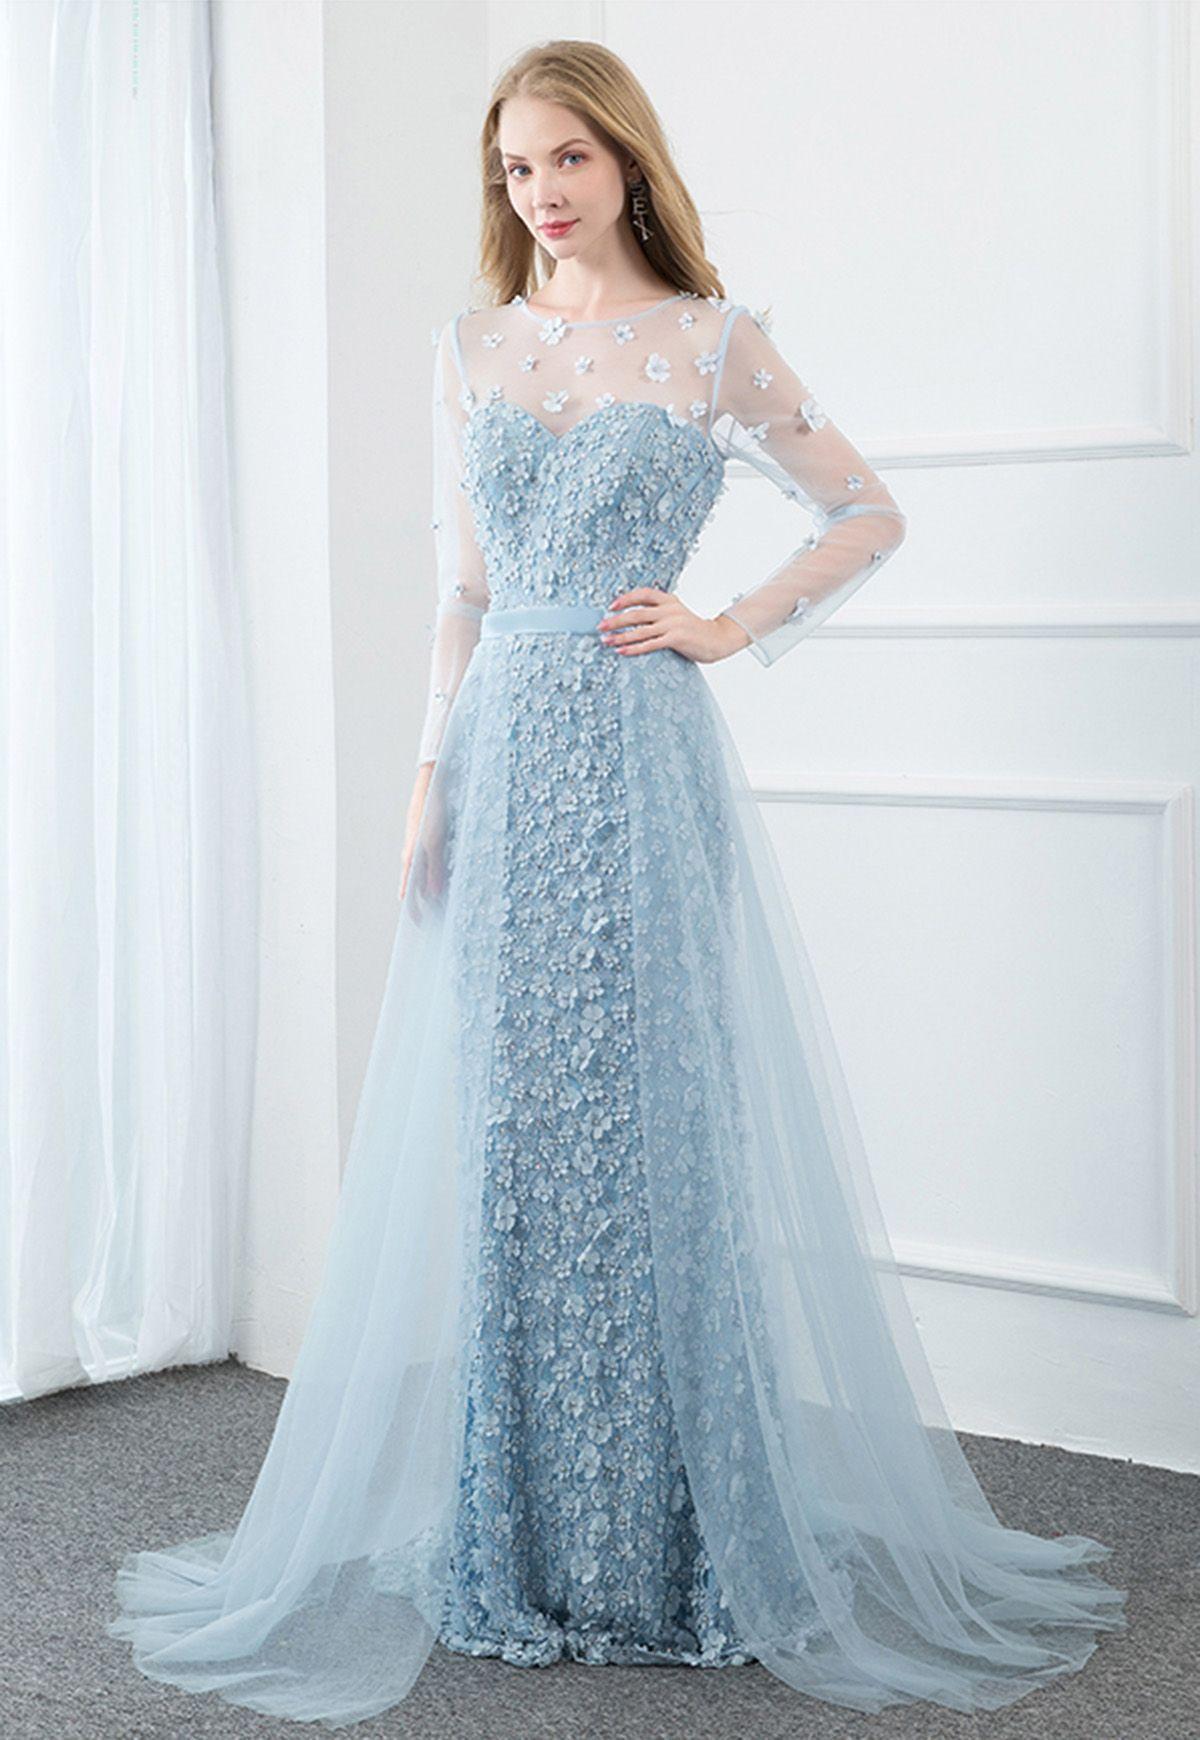 Blue Tulle Flower Long Mermaid Dress Blue Formal Dress With Applique Long Mermaid Dress Light Blue Prom Dress Mermaid Dress [ 1740 x 1200 Pixel ]